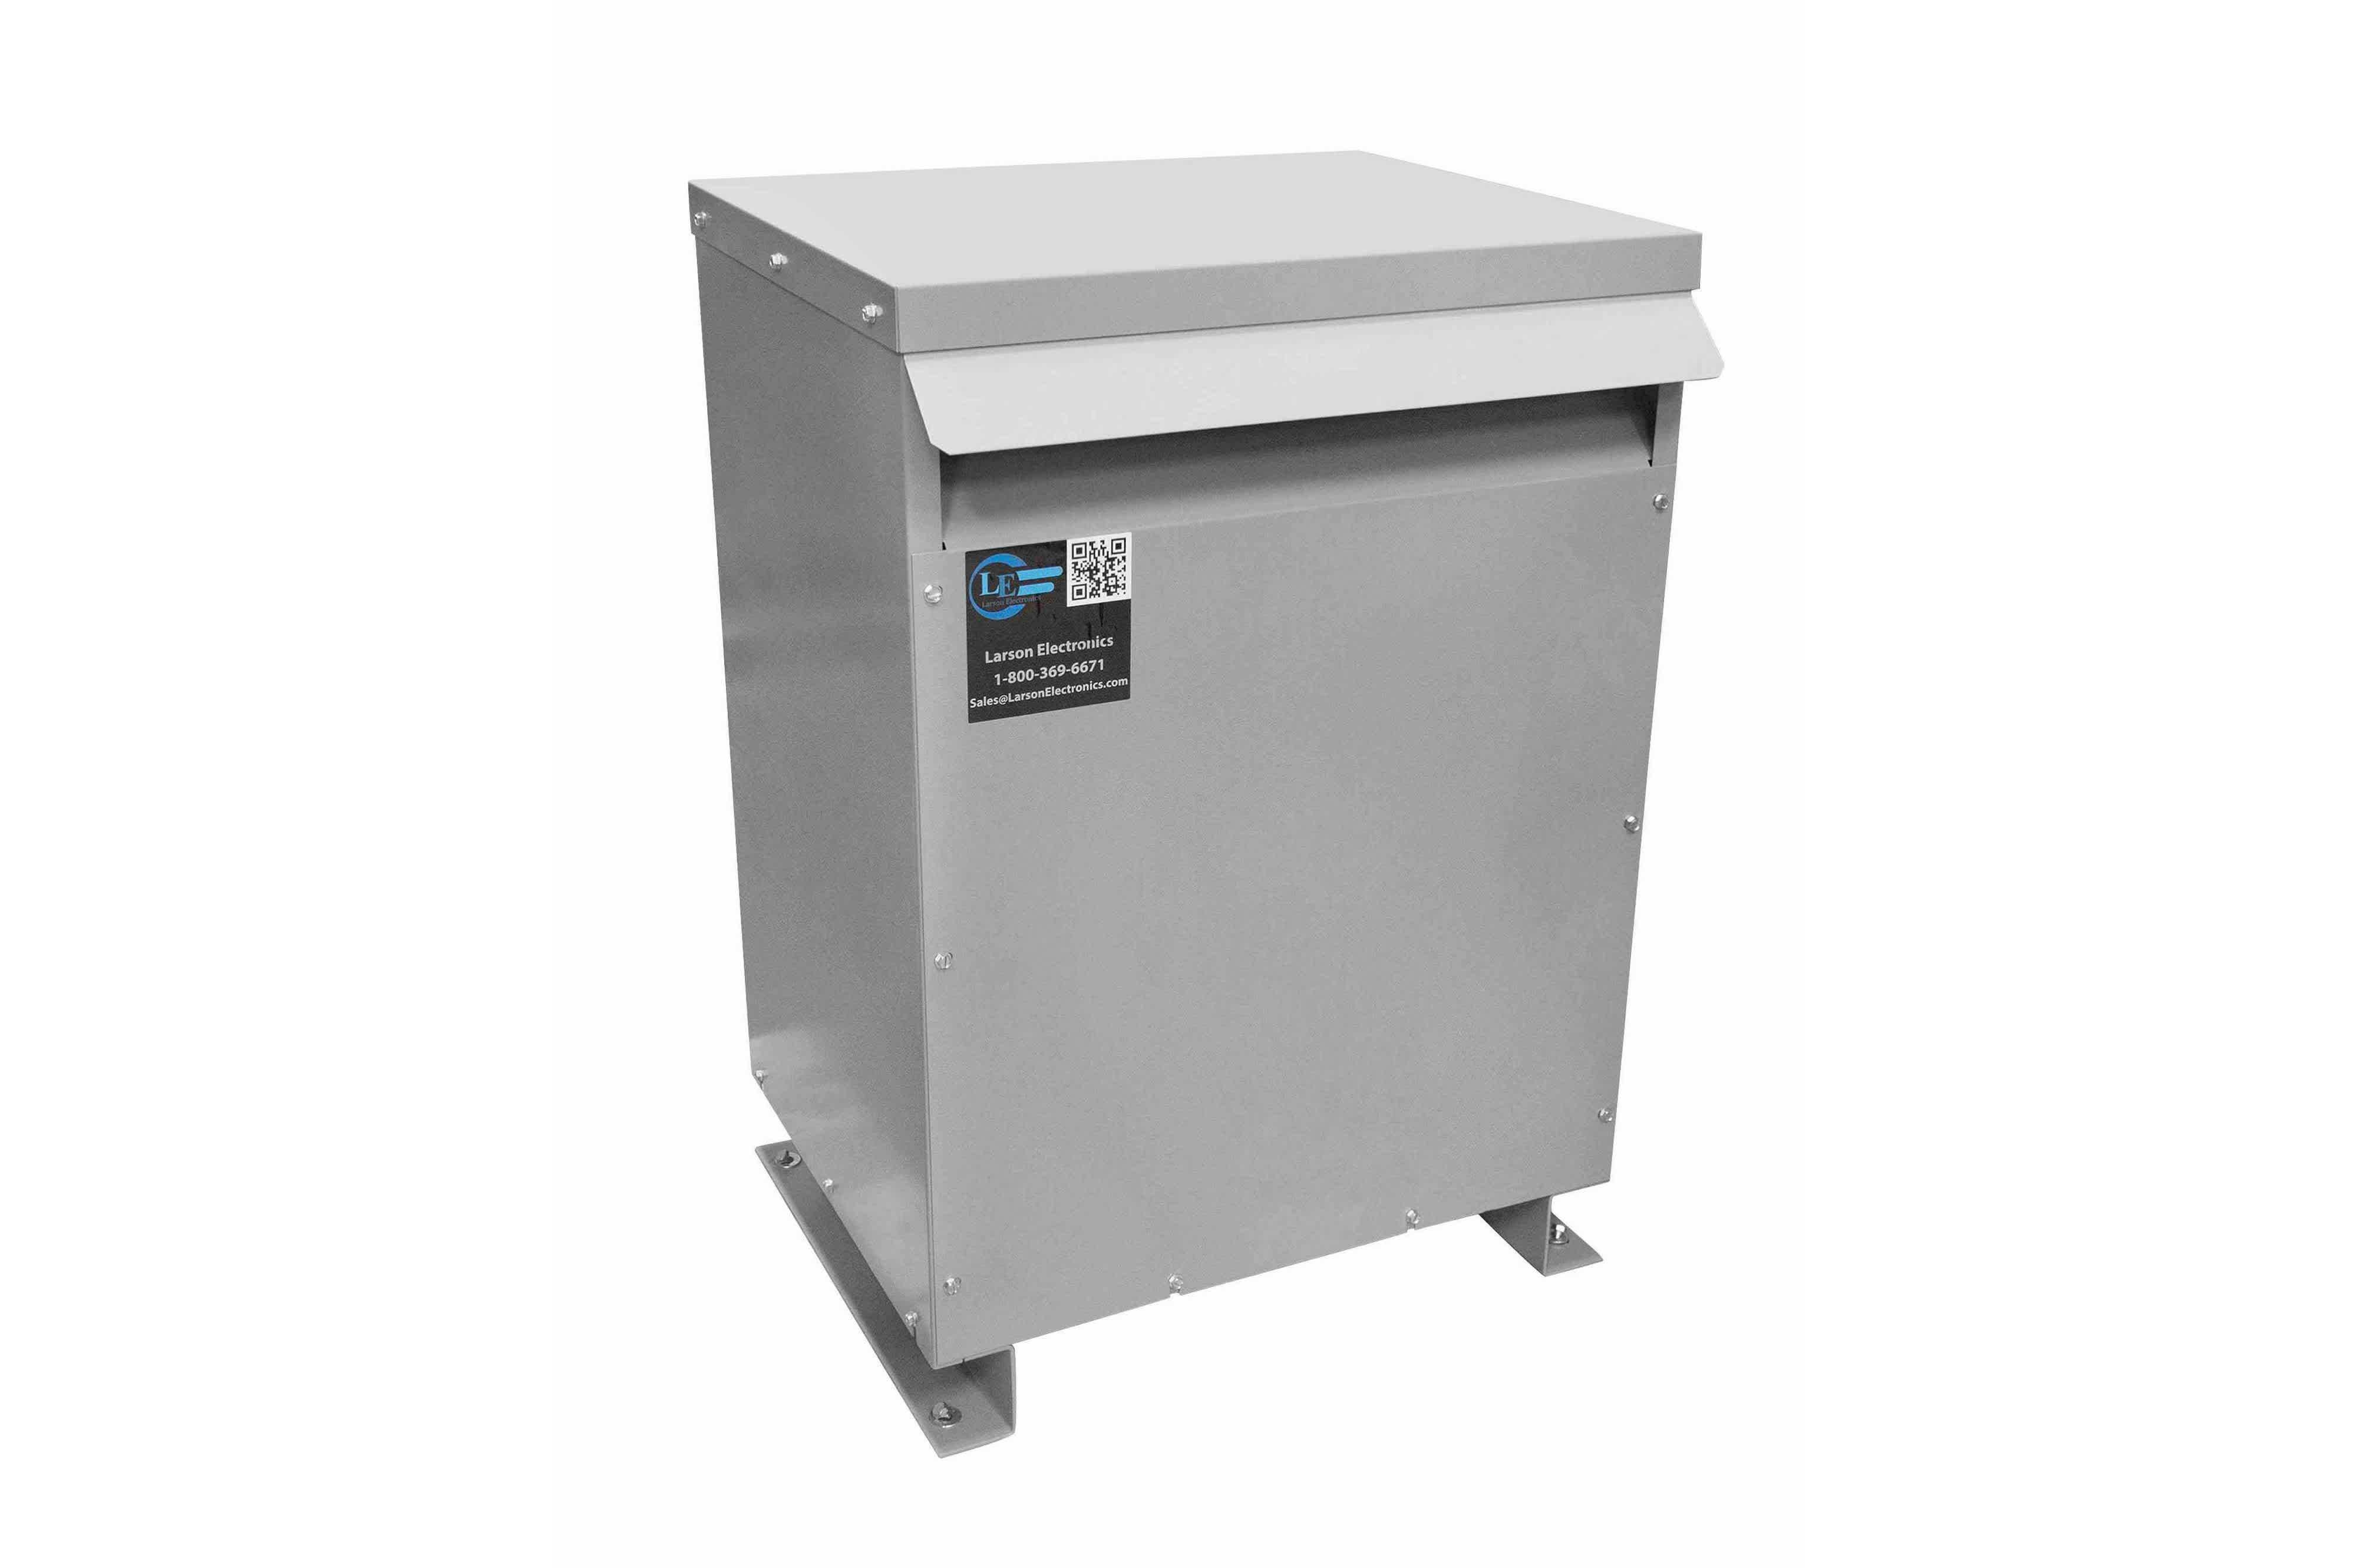 9 kVA 3PH Isolation Transformer, 240V Wye Primary, 208V Delta Secondary, N3R, Ventilated, 60 Hz